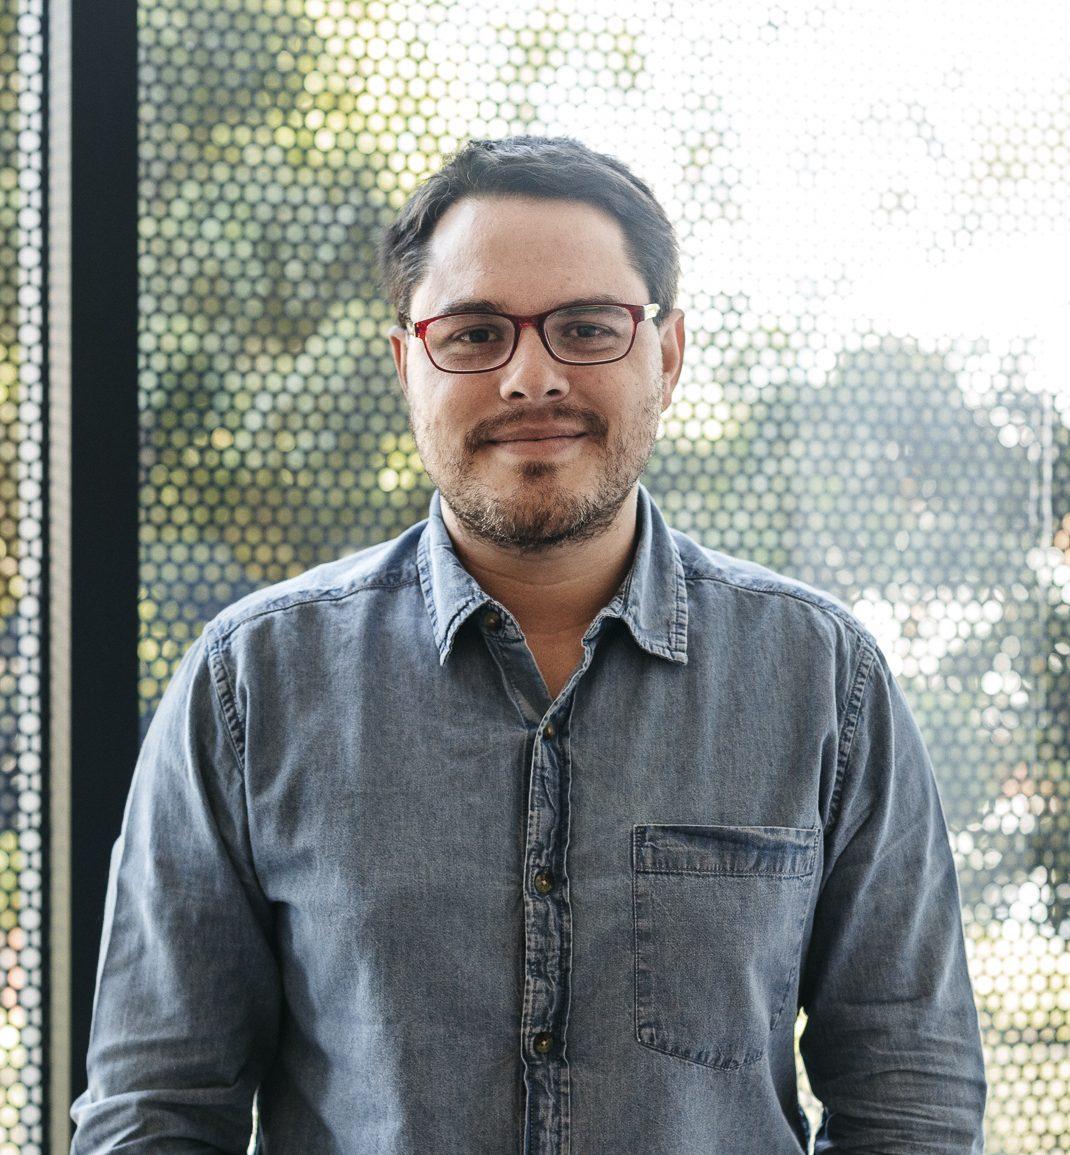 José Manuel Correa